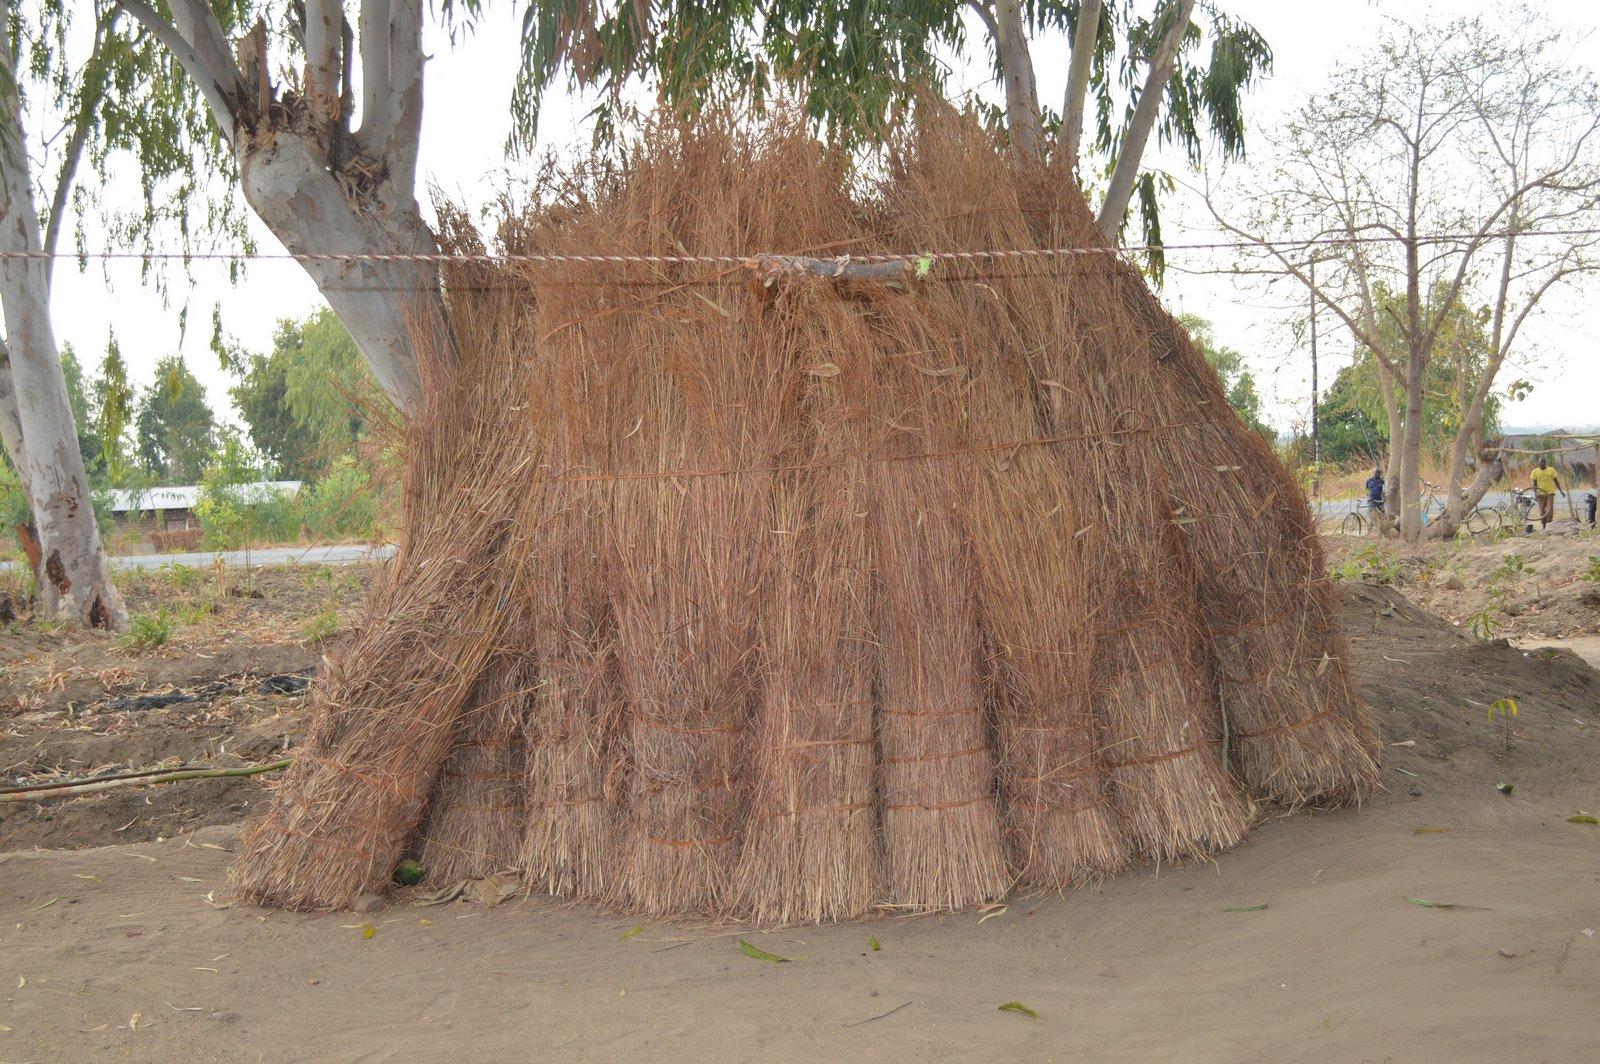 Chikasima, Nkhata Bay (27).JPG